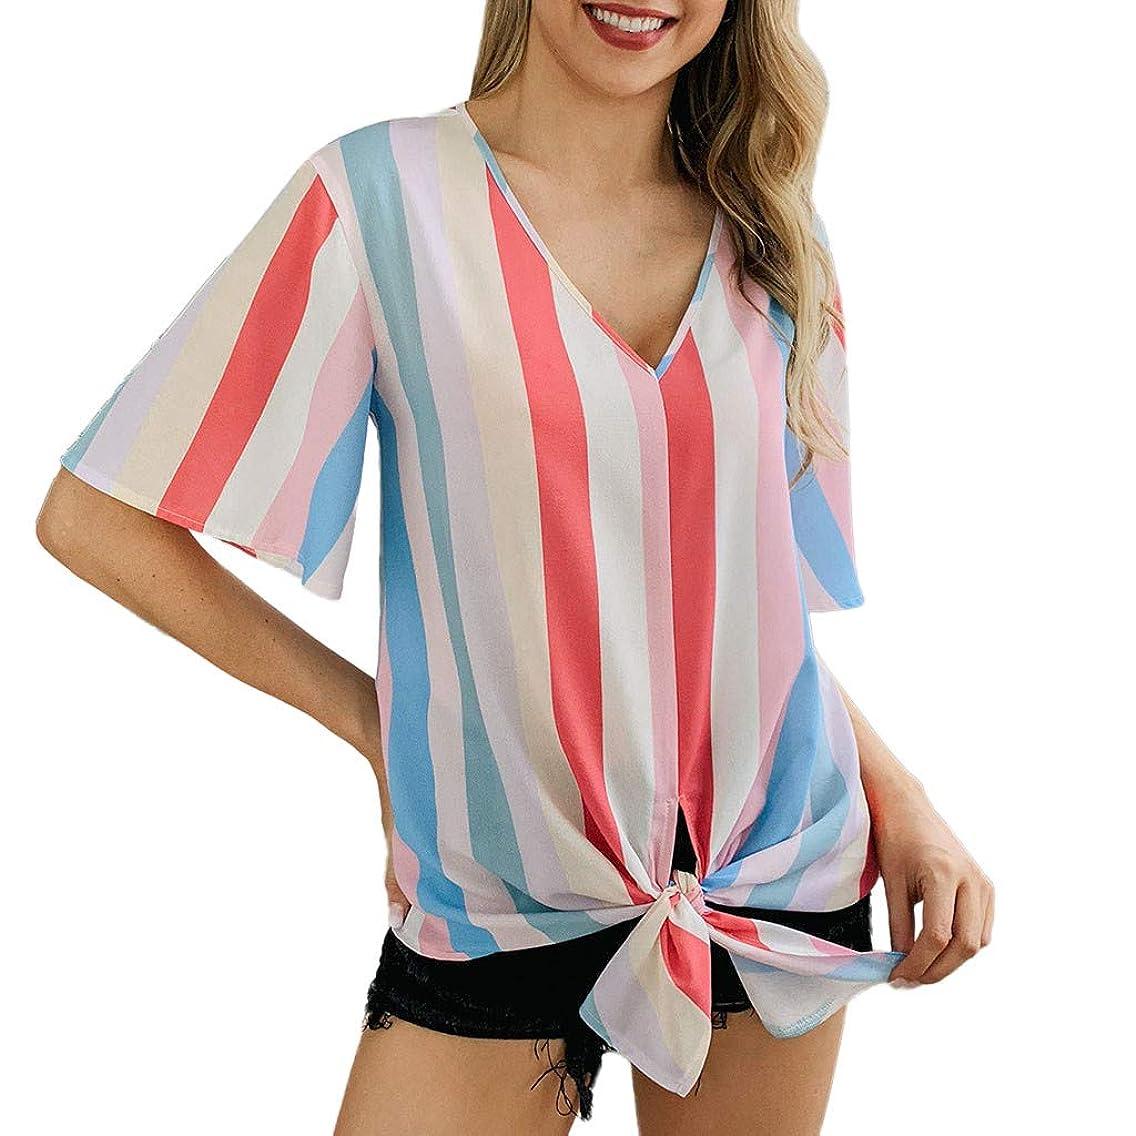 Summer Tops for Women 2019 Tronet Women Summer Stripe Printing V Neck Short Sleeve Shirt Casual Tunic Tops Blouse